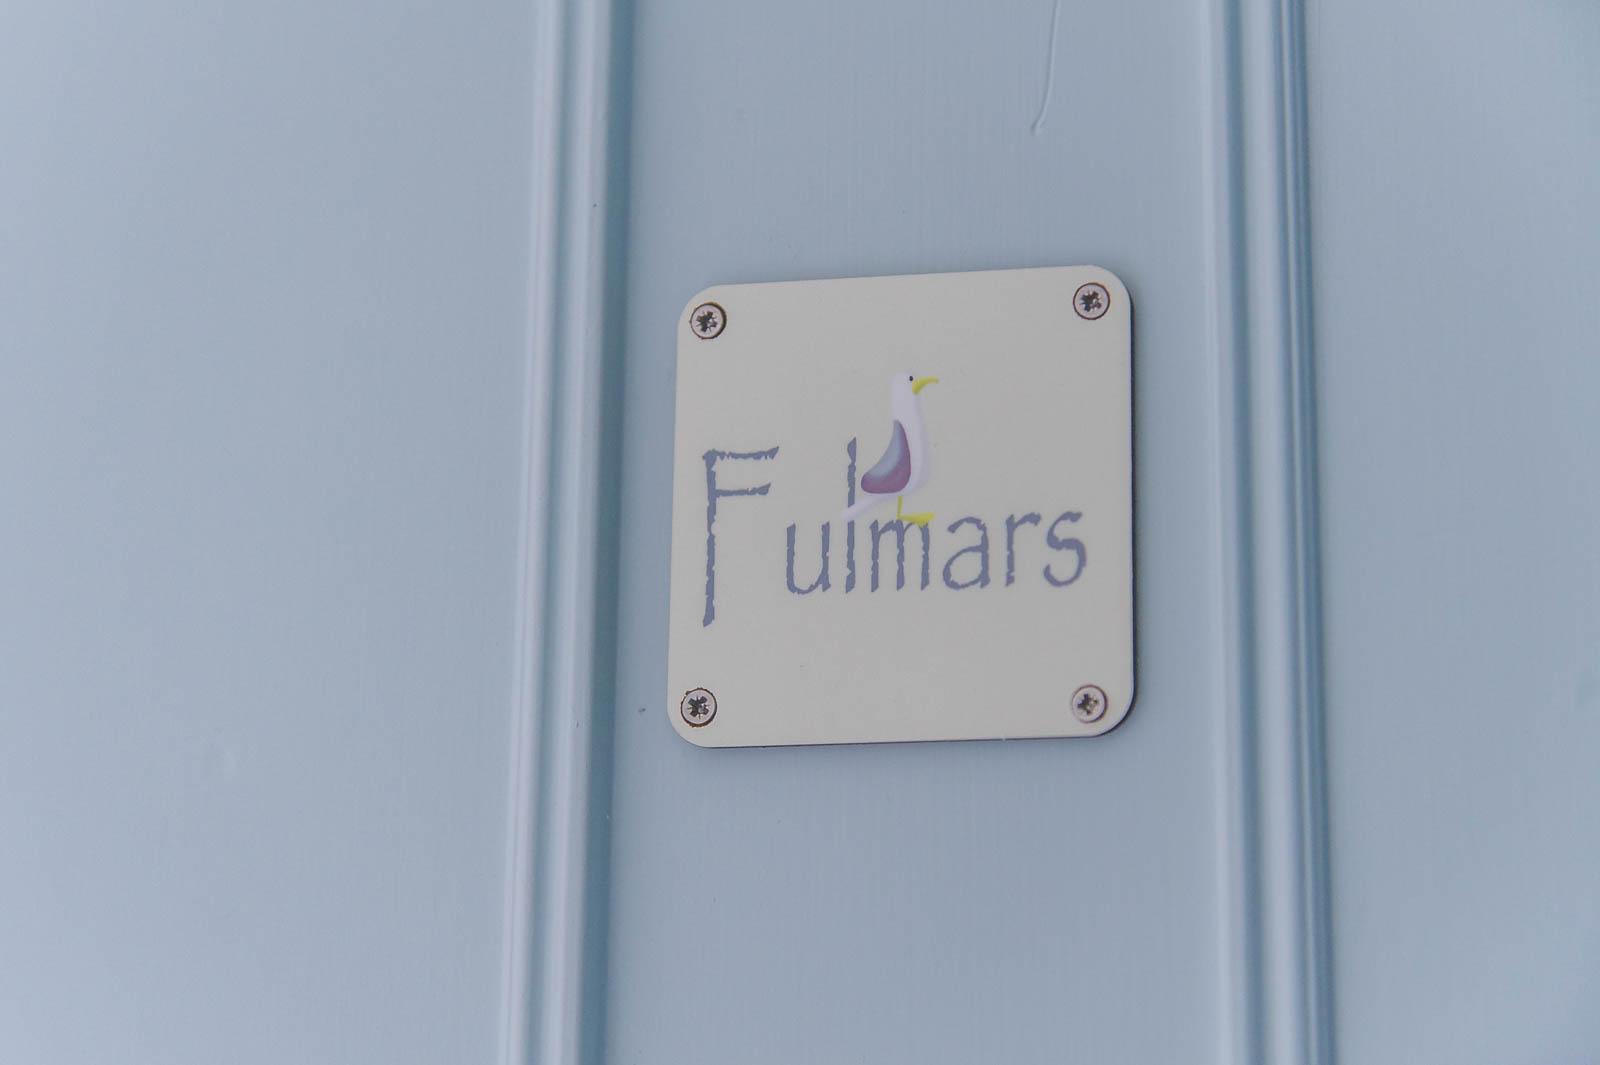 The Bluff Fulmars Bedroom